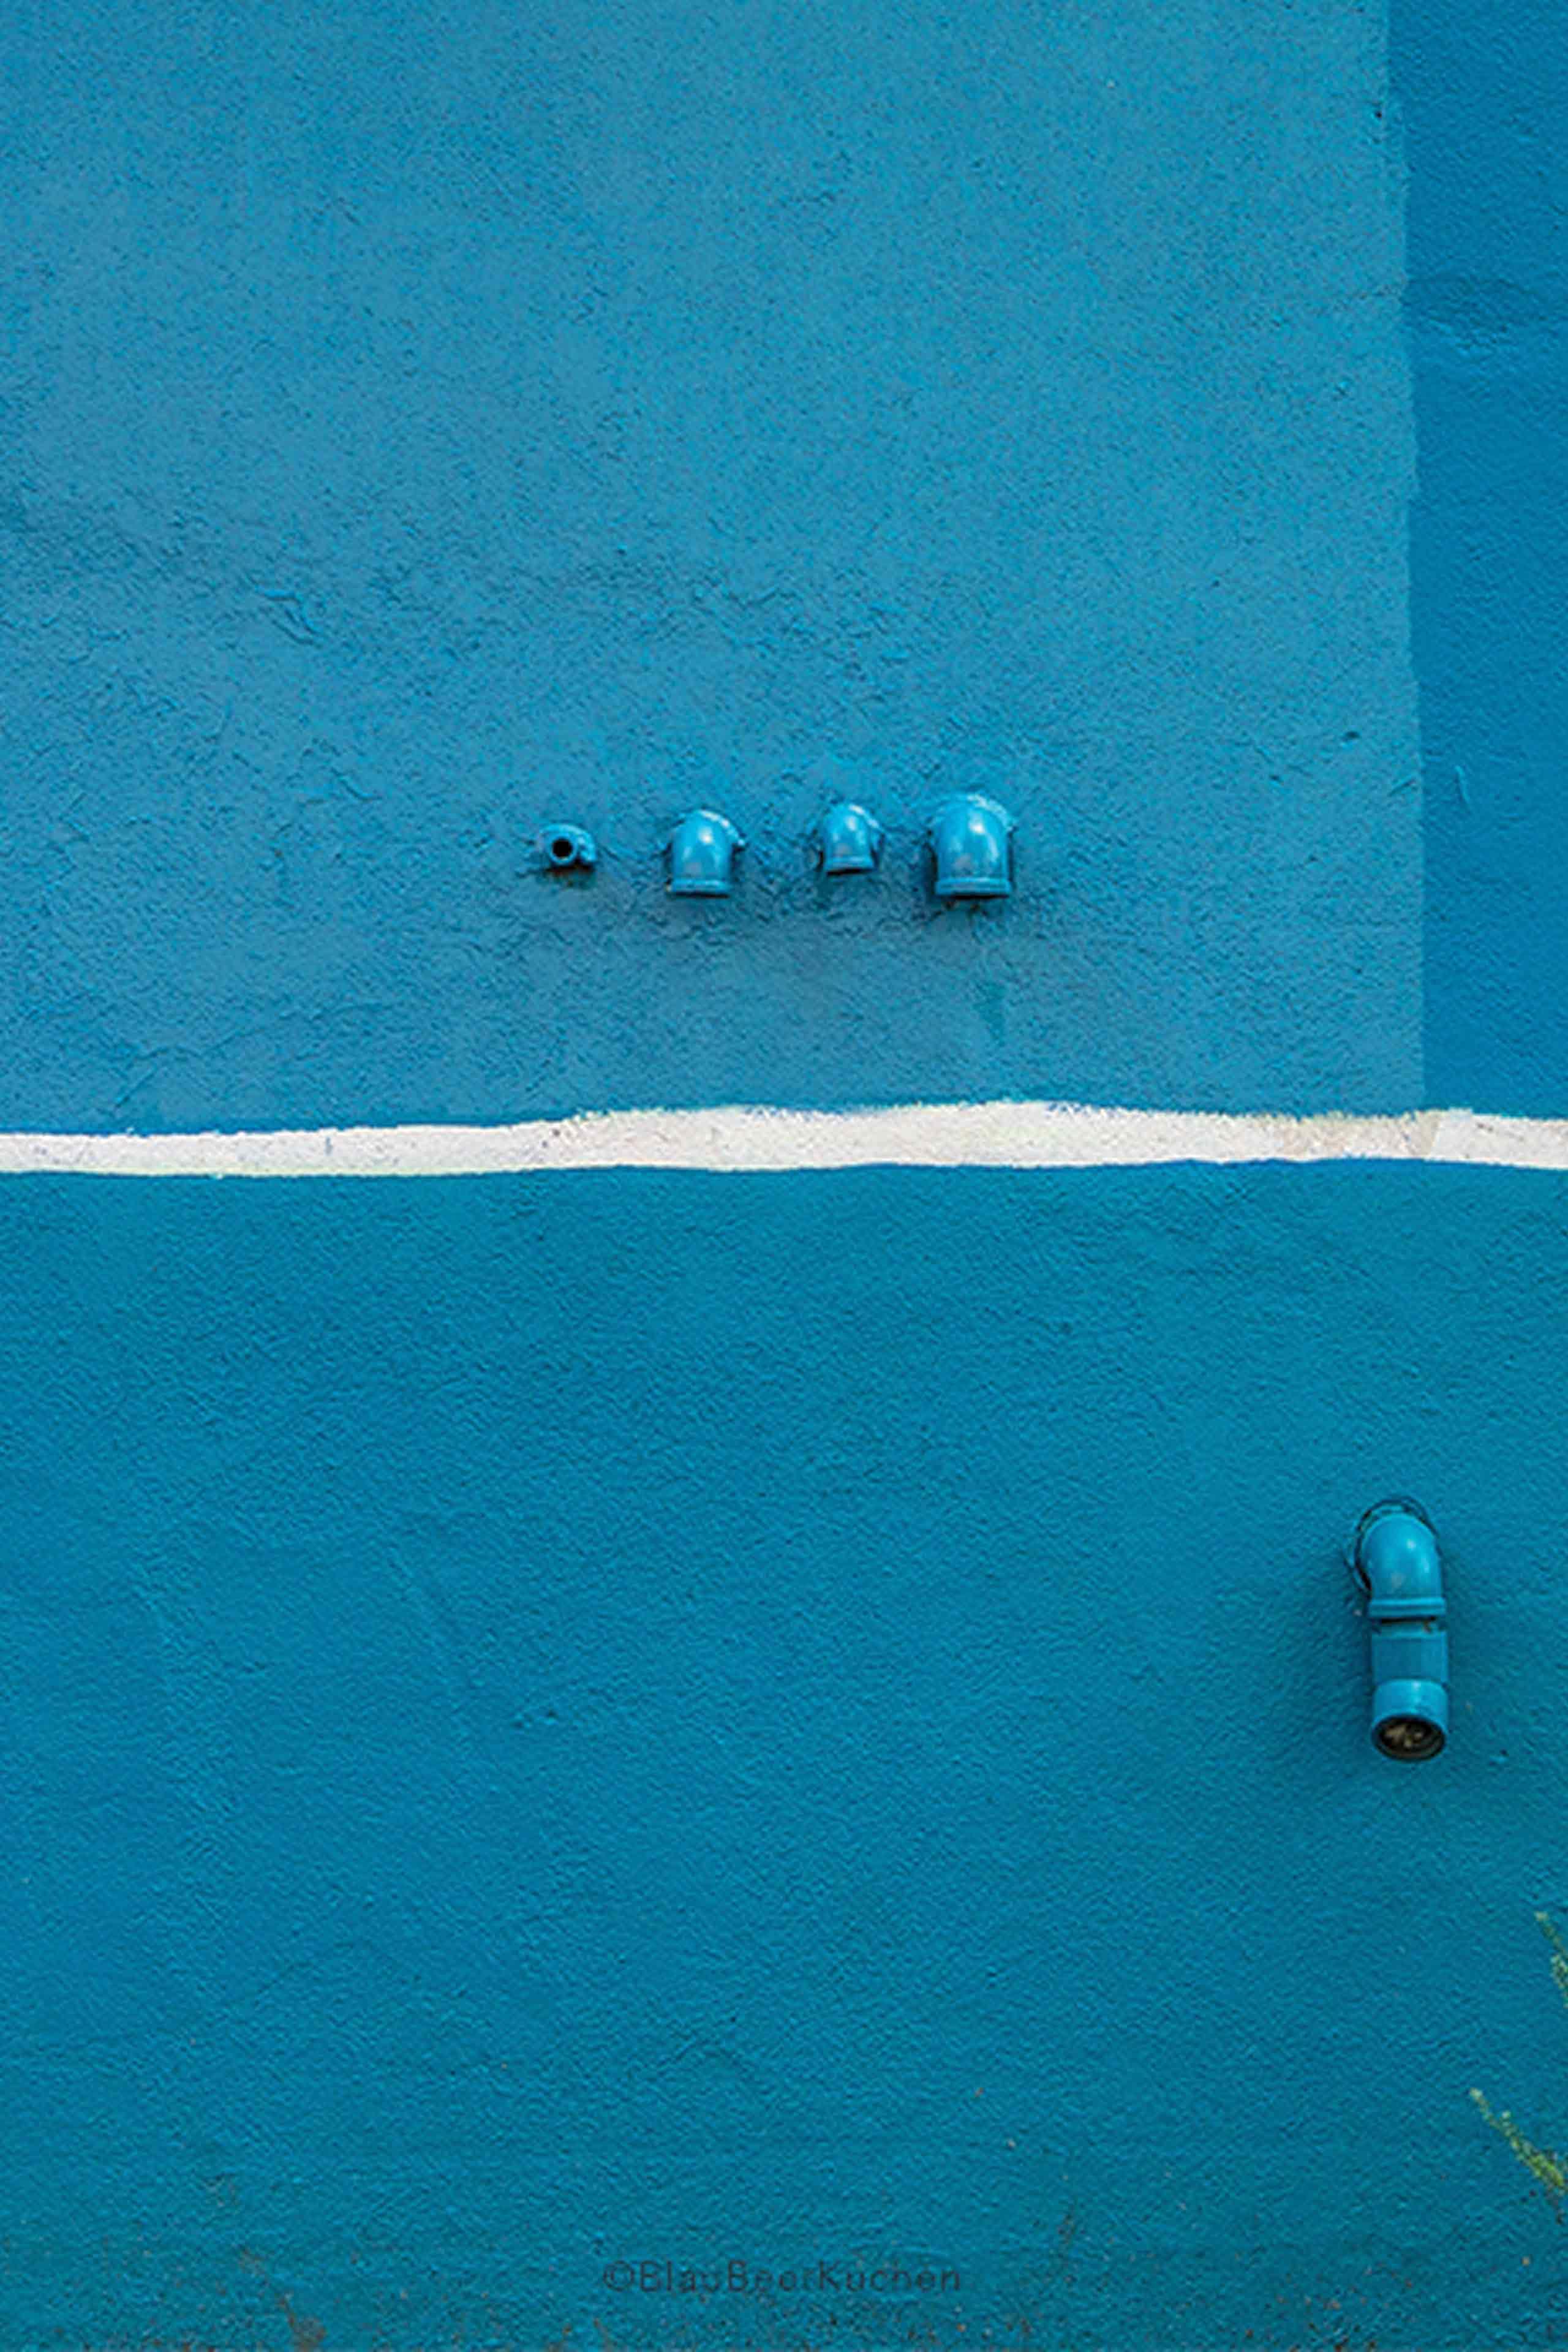 Minimalist Iphone Teal Wallpapers Top Free Minimalist